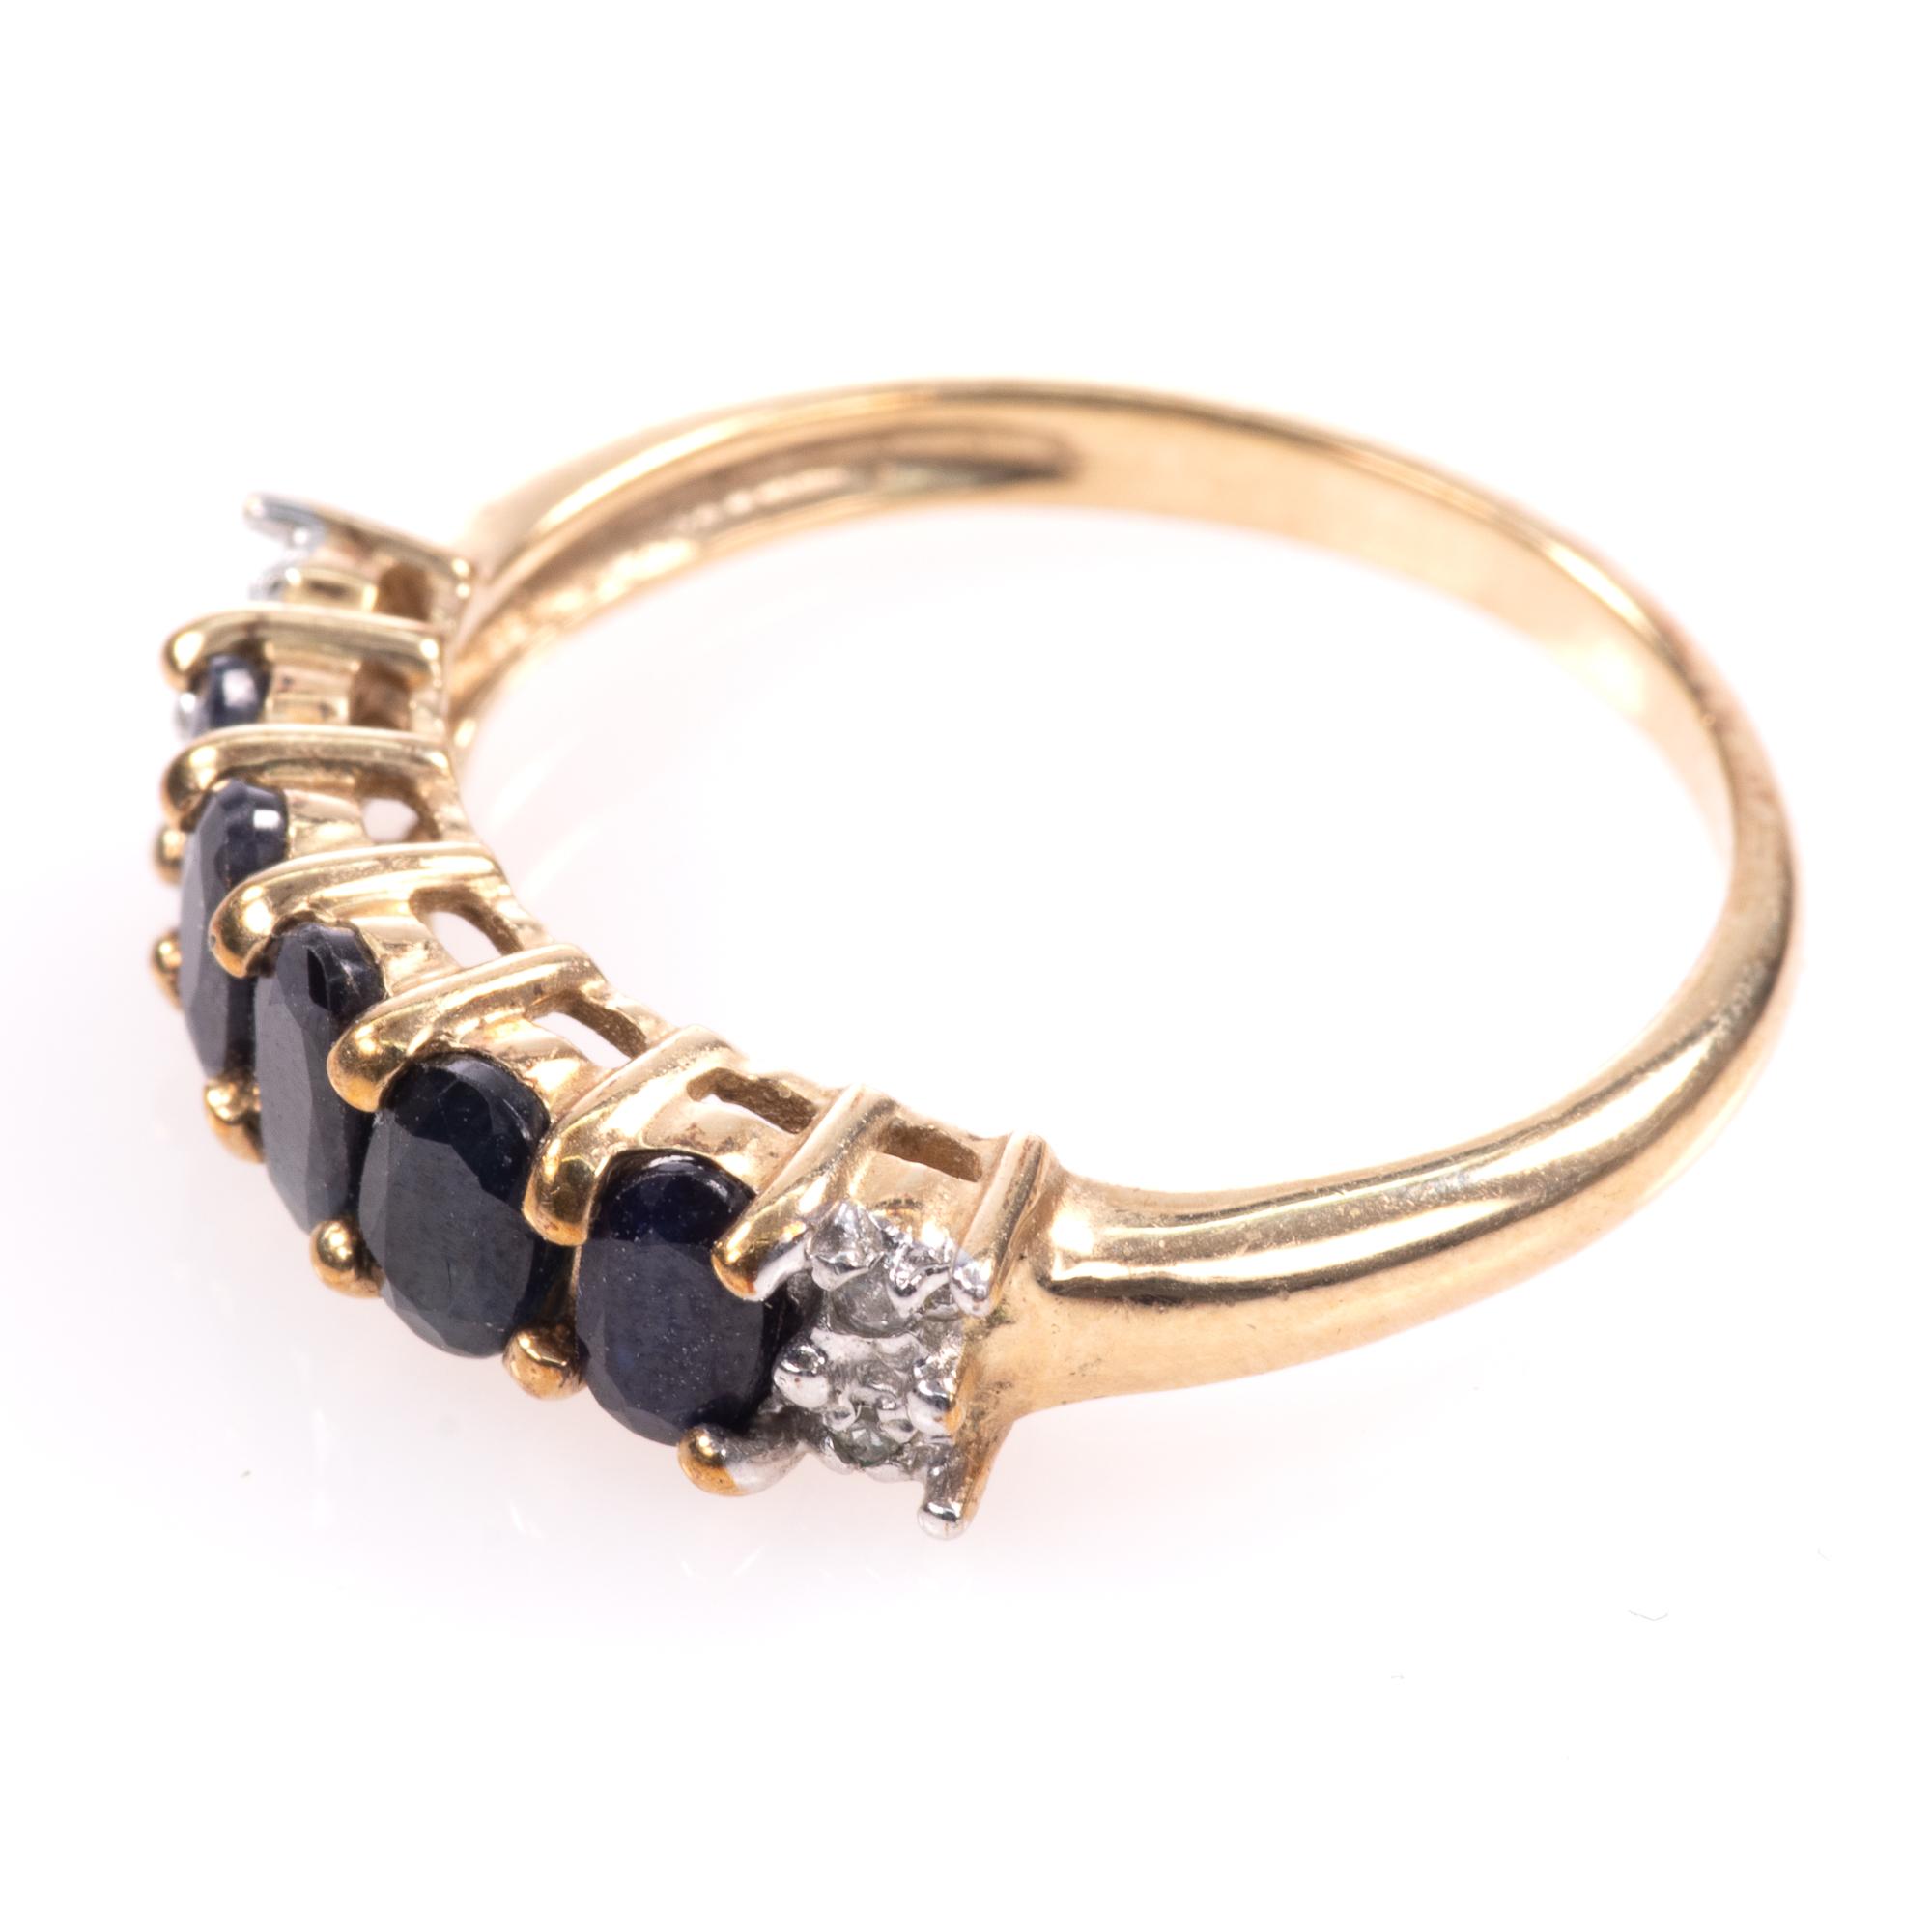 9ct Gold 5ct Sapphire & Diamond Ring - Image 4 of 7